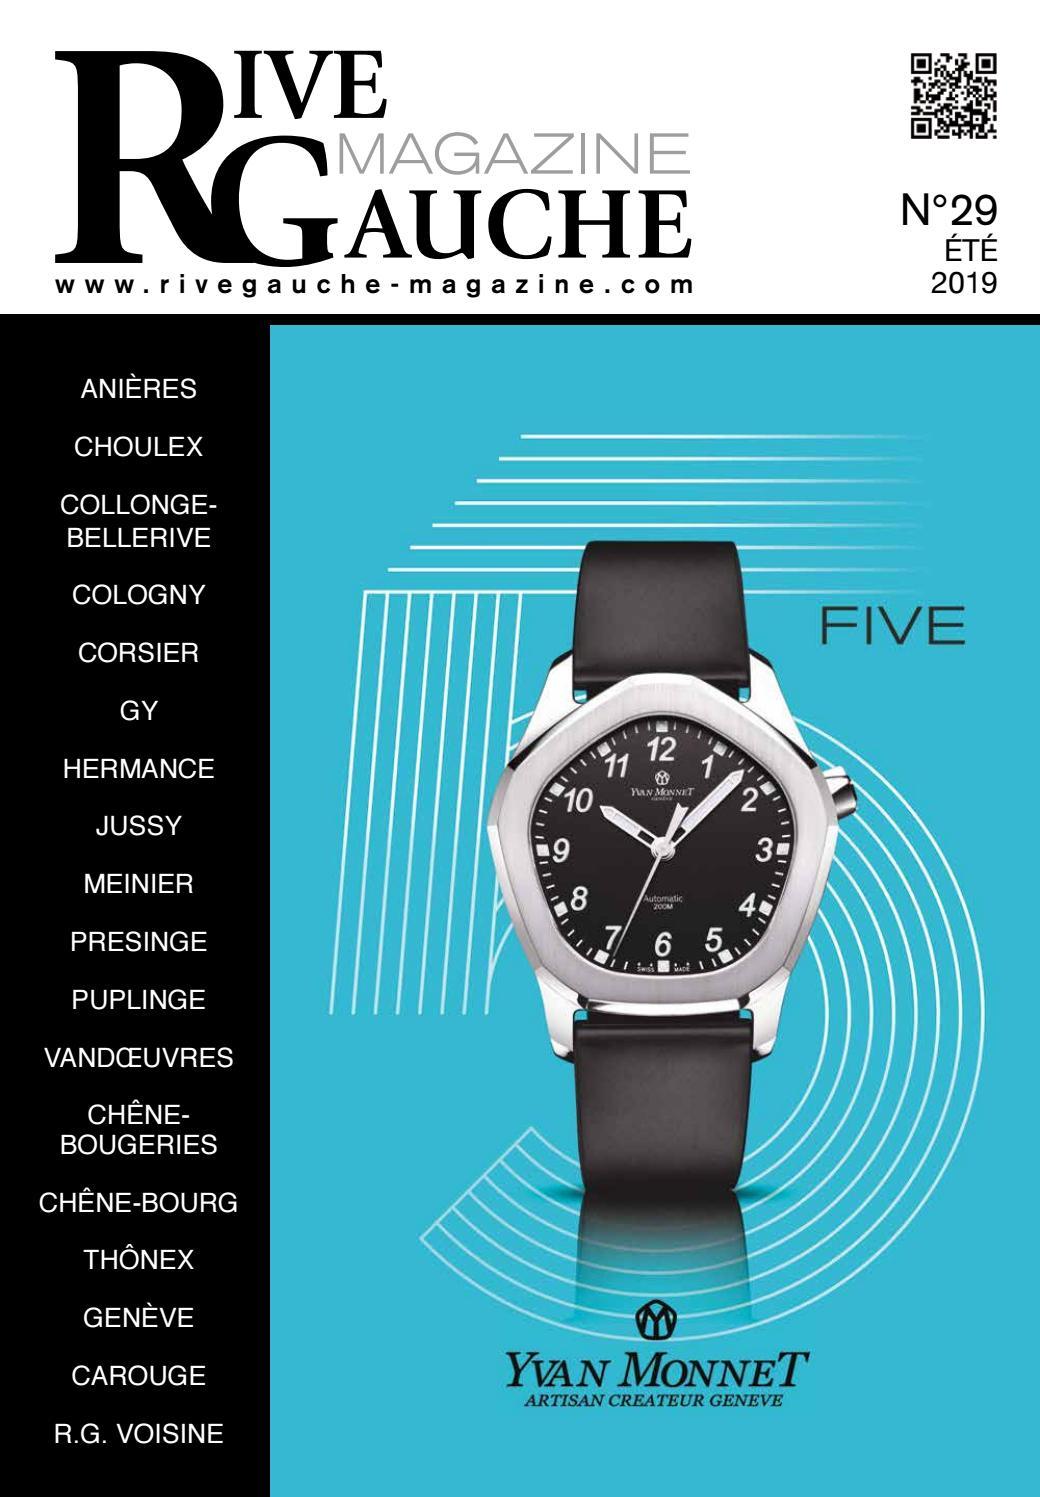 Rive Gauche Magazine N°29 By Daniel - Issuu serapportantà Coloriage Ralph La Casse